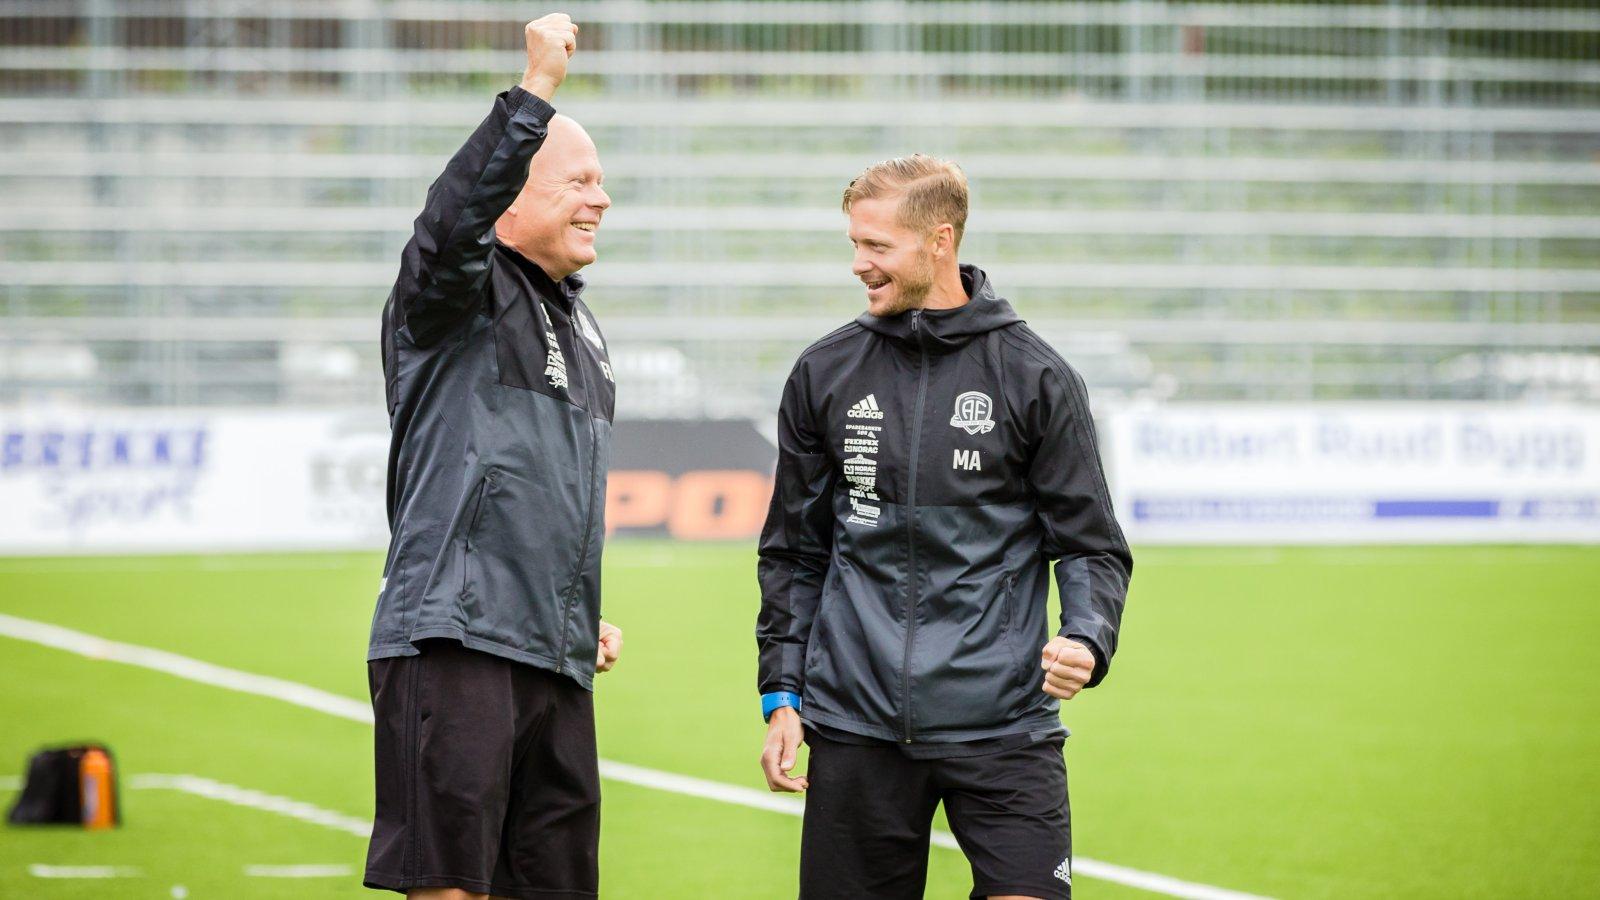 Frank Bredal og Mattias Andersson.